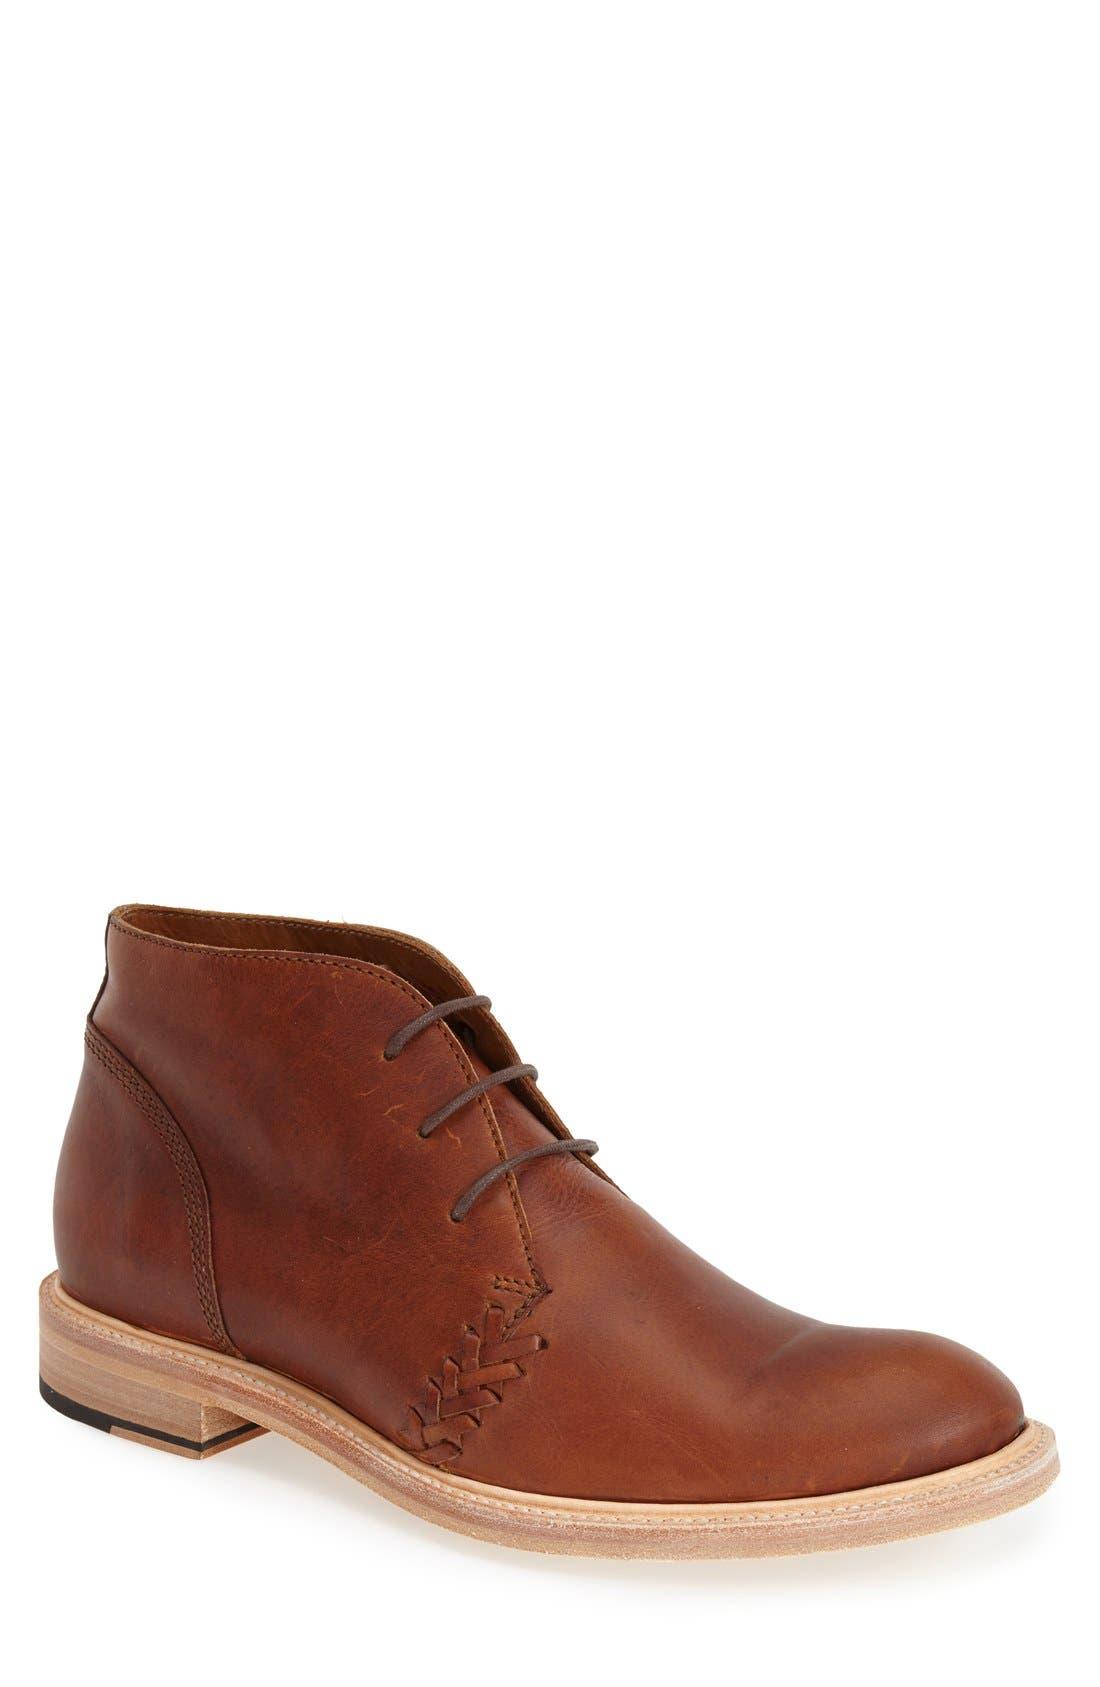 Sendra Boots 'Noris' Chukka Boot (Men)